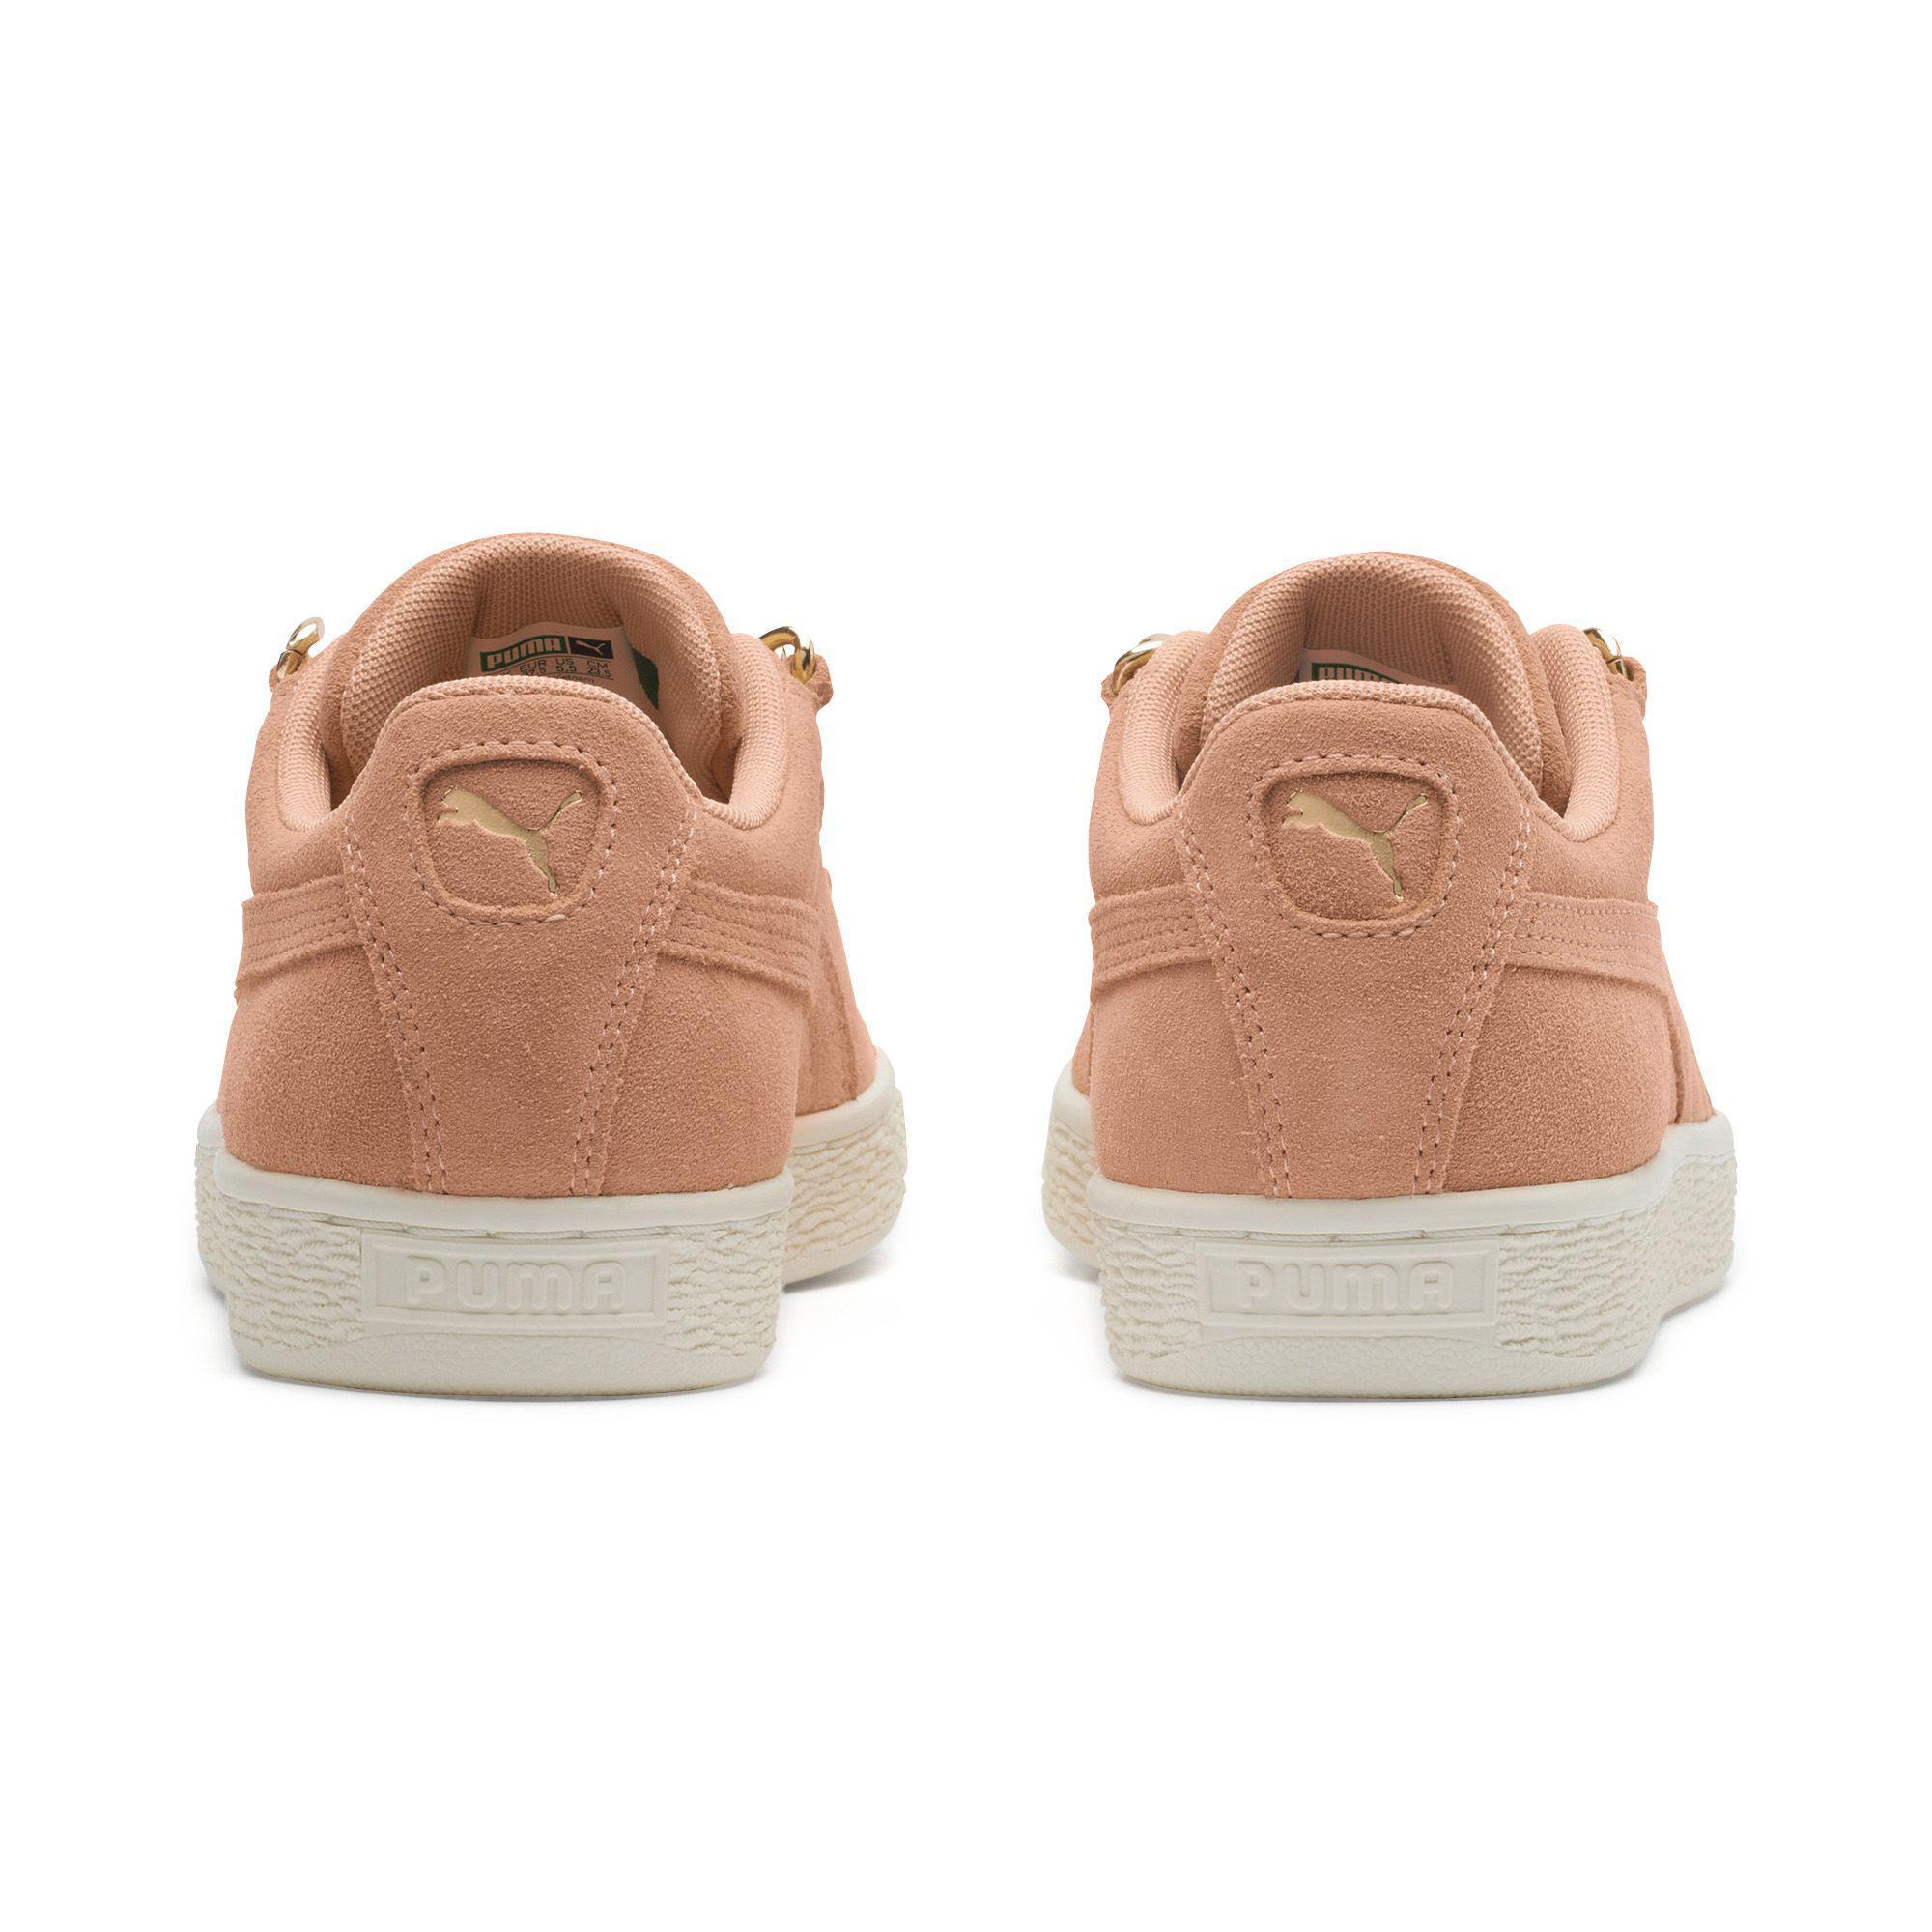 baa85738859 Lyst - PUMA Suede Classic Chain Women s Sneakers